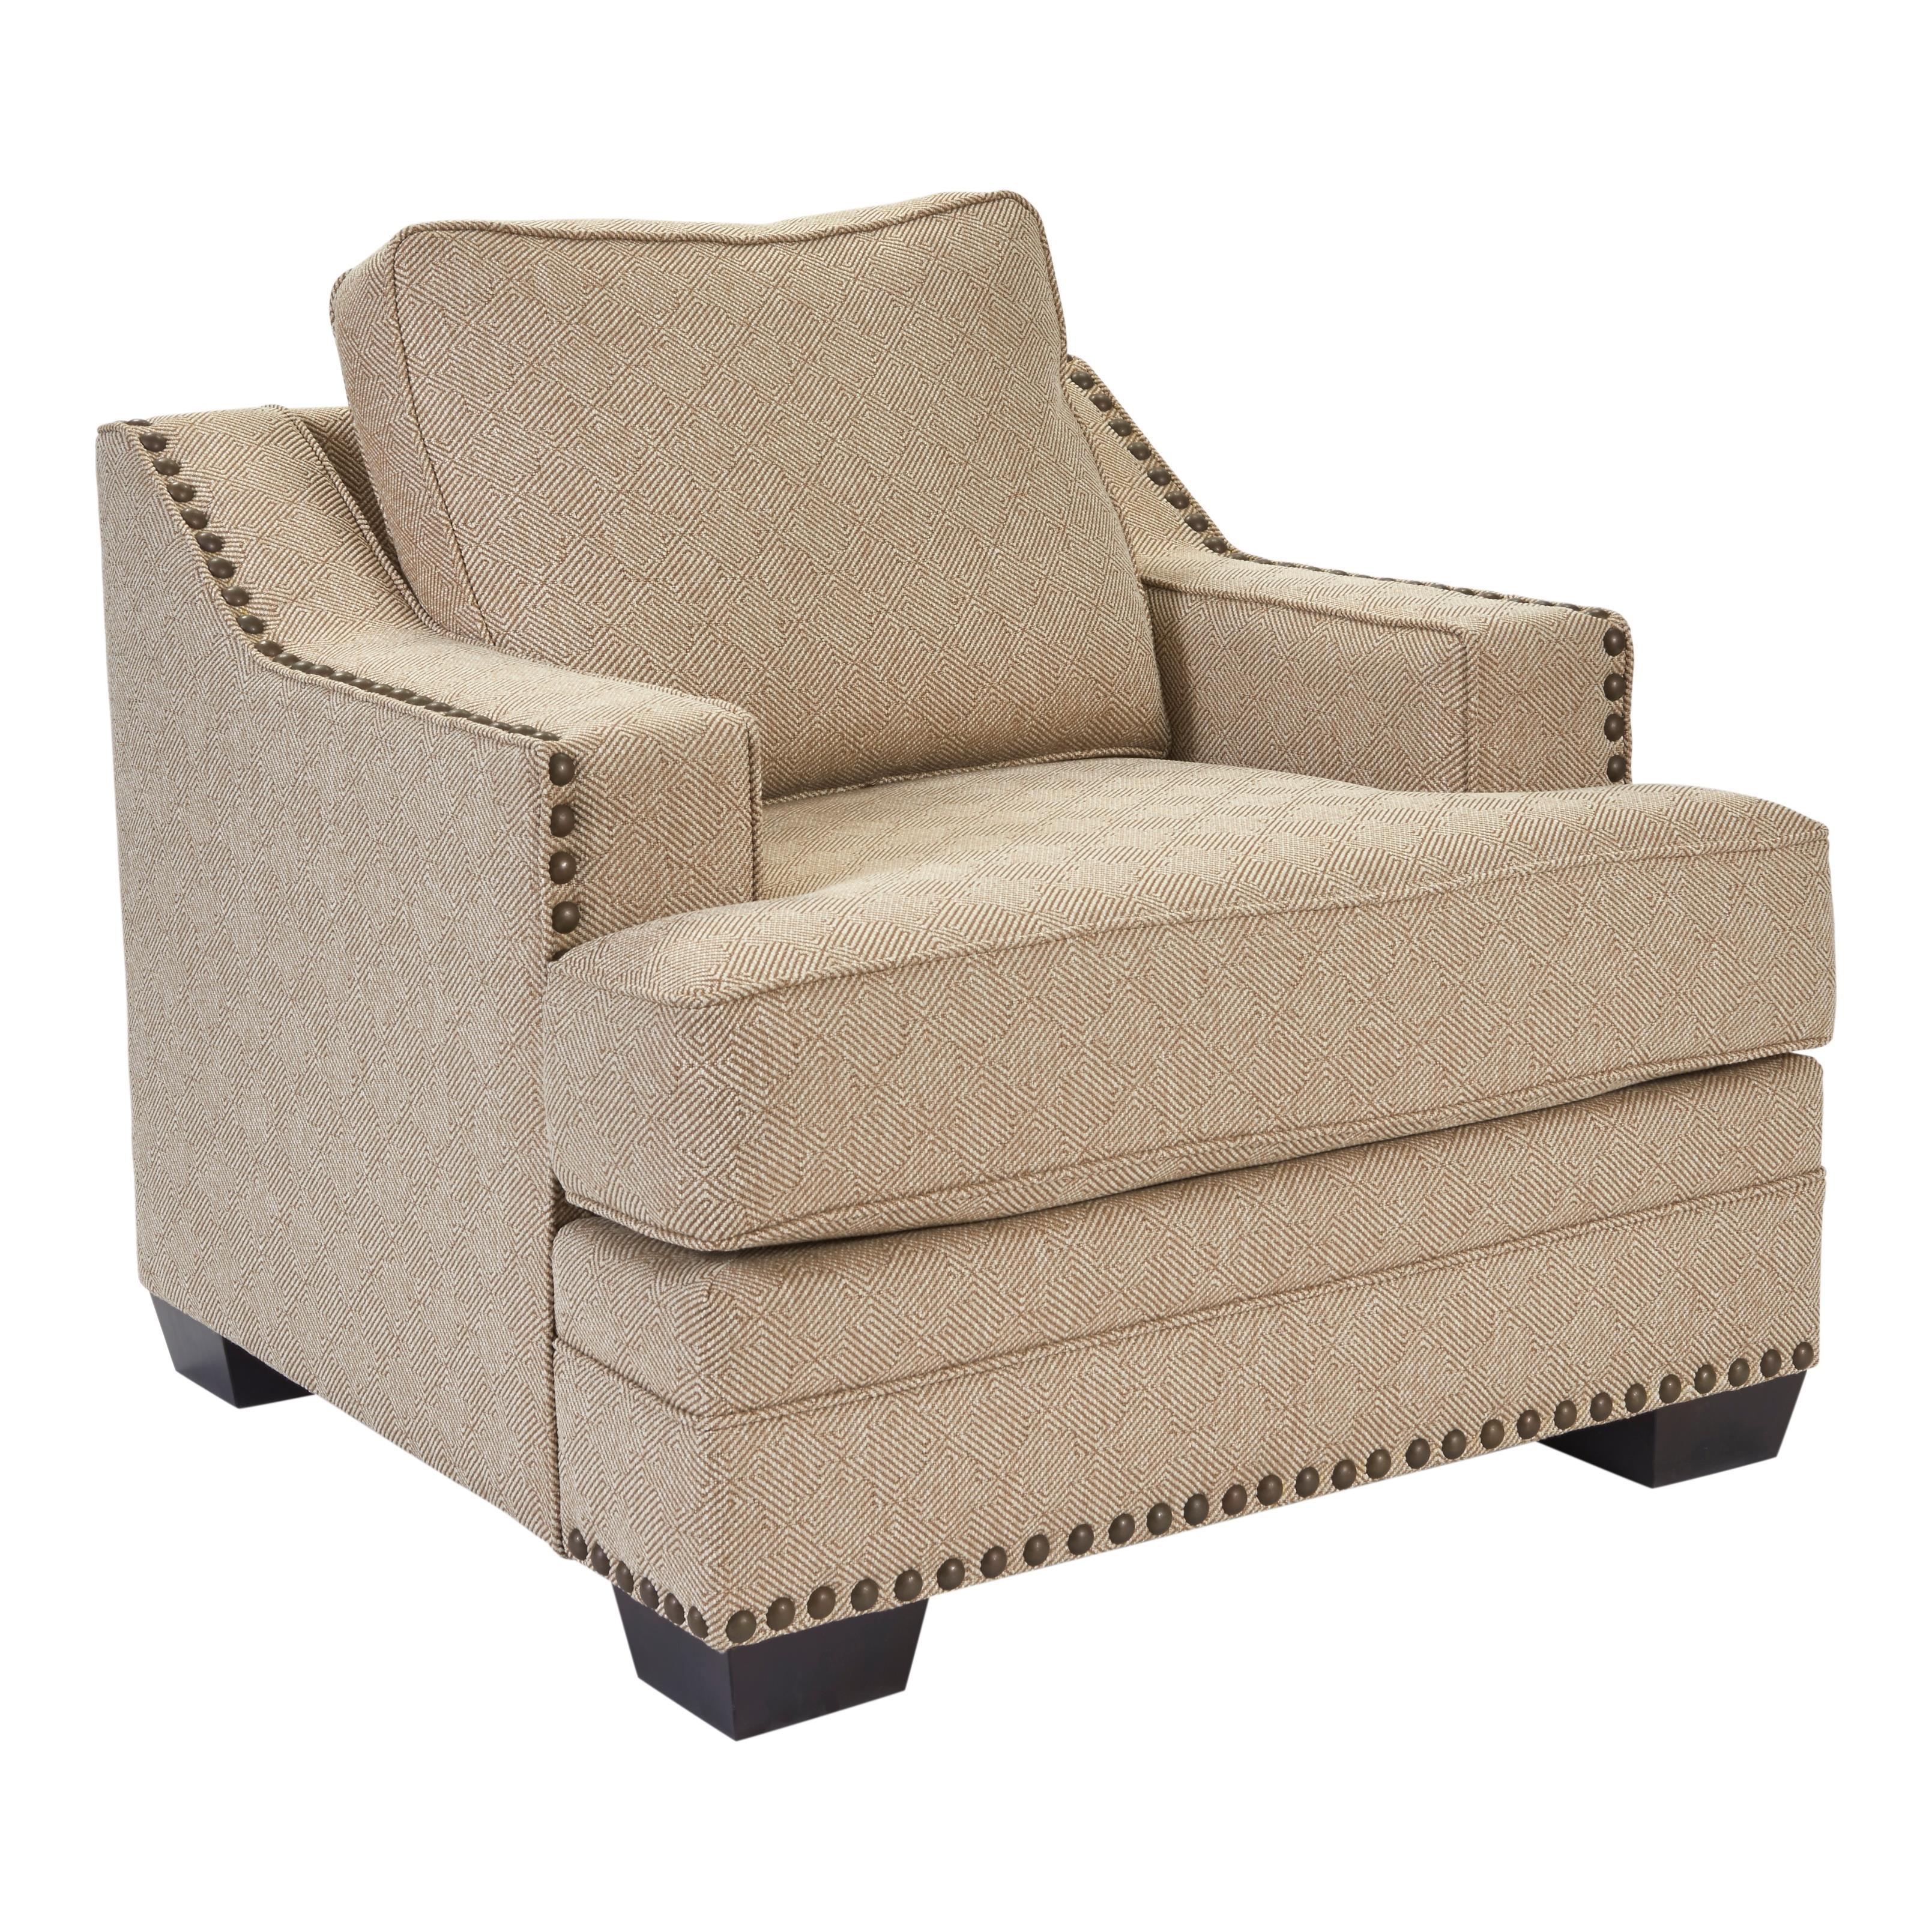 Broyhill Furniture Estes Park Chair - Item Number: 4263-0-4263-82